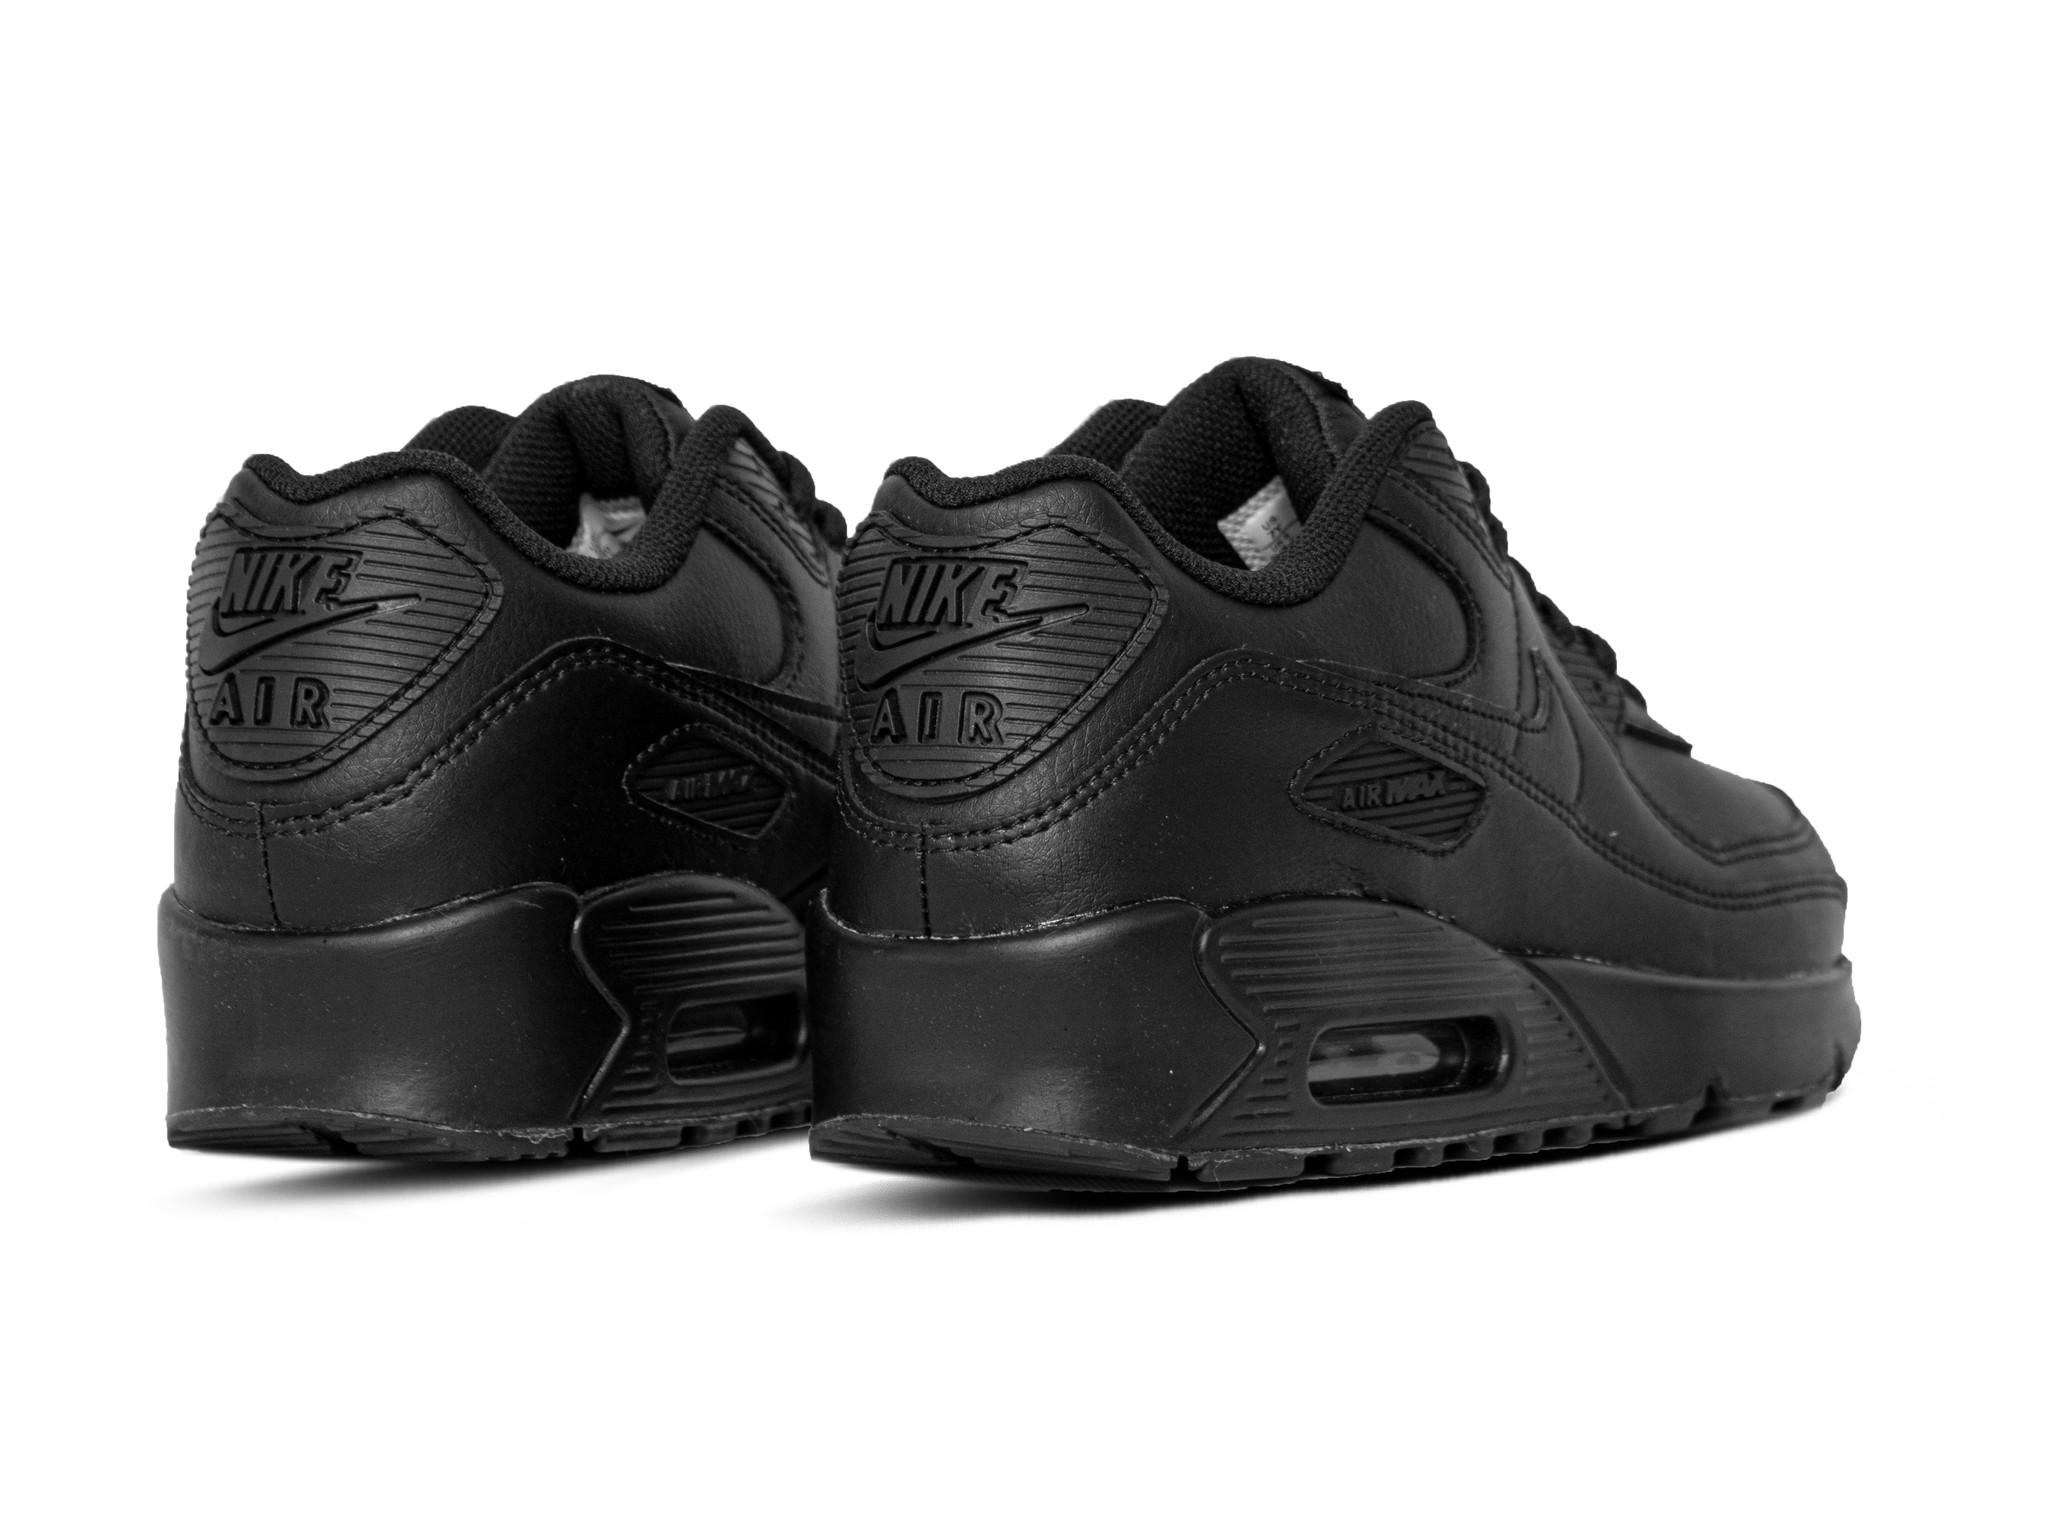 Nike Air Max 90 GS LTR Black Black White CD6864 001